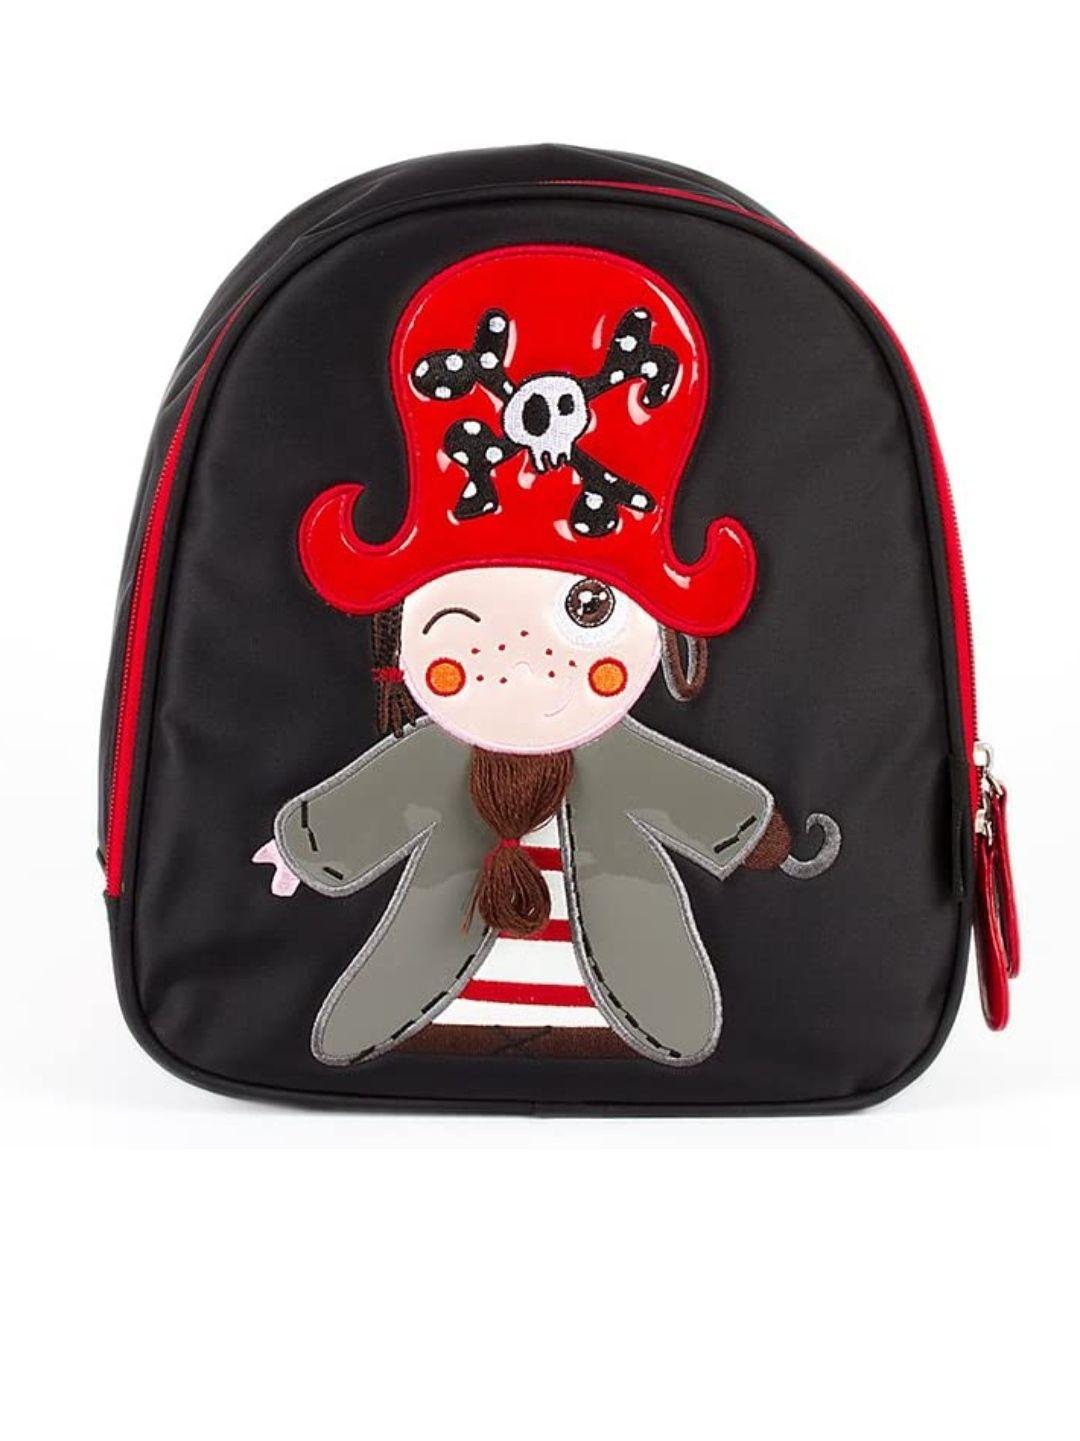 Mochila Infantil The Pirates Boy KIWISAC. Válido para promoción del Prime day